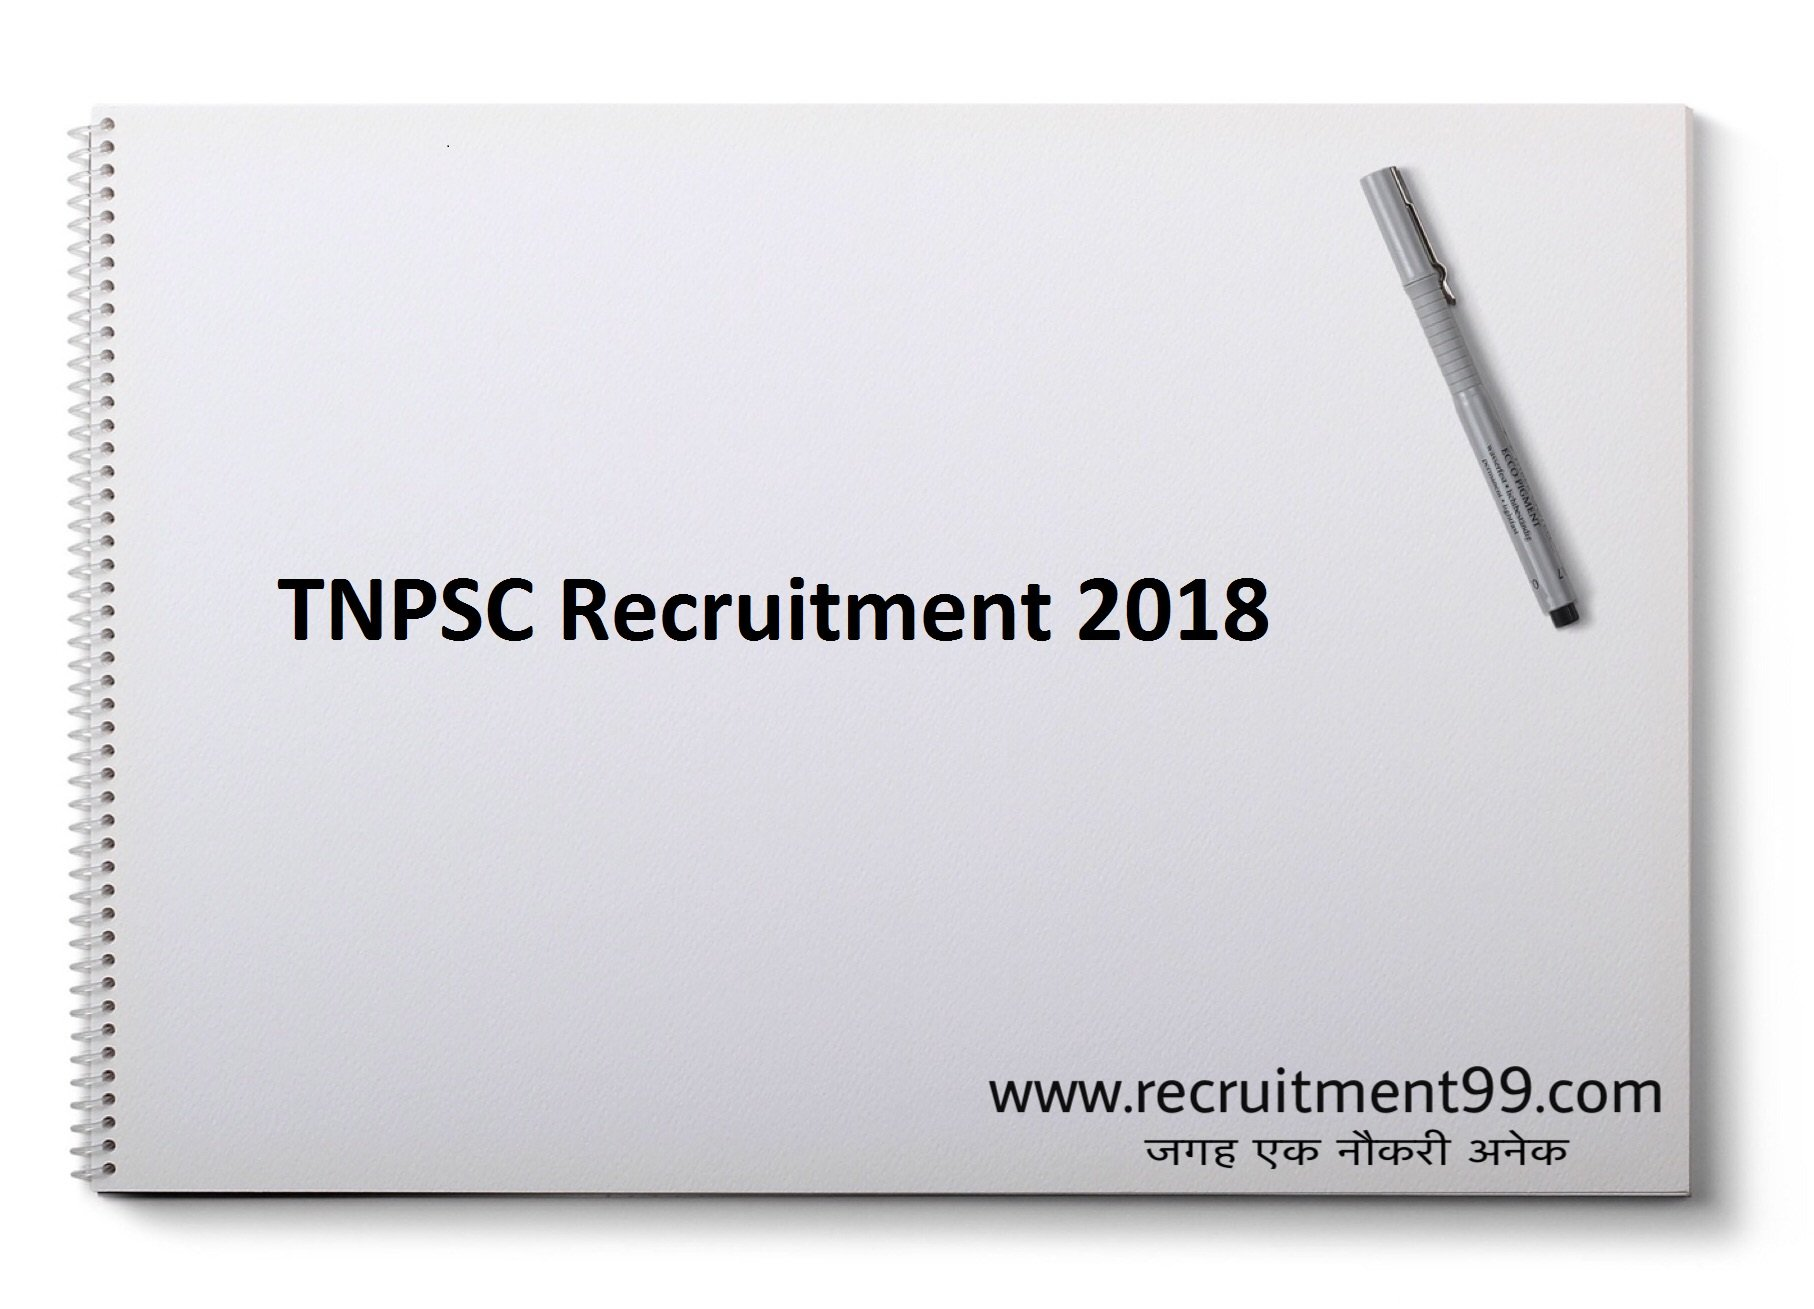 TNPSC CCSE II Recruitment Admit Card Result 2018